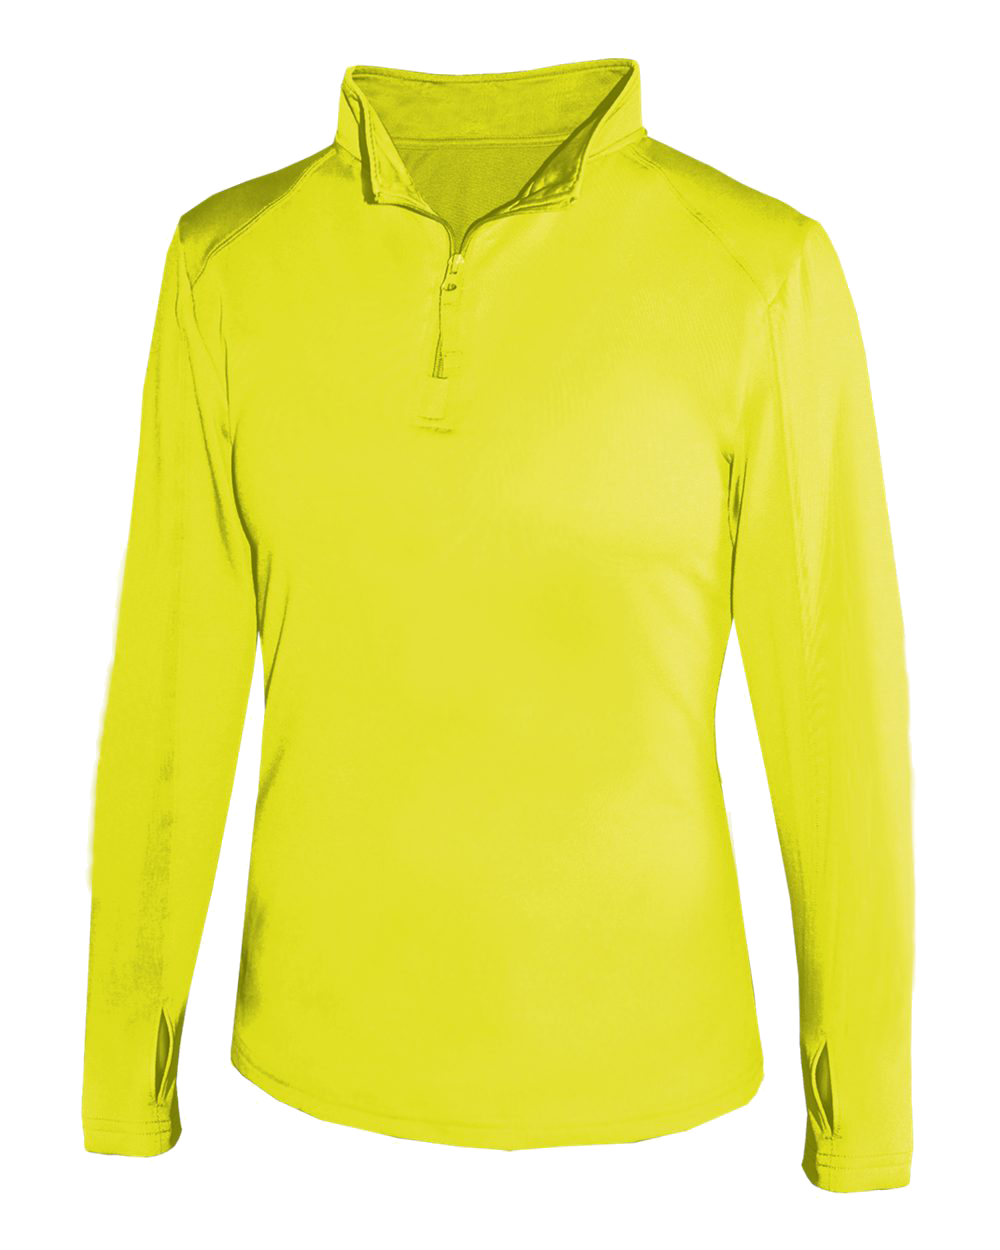 1/4 Zip Women's Lightweight Pullover - Safety Yellow